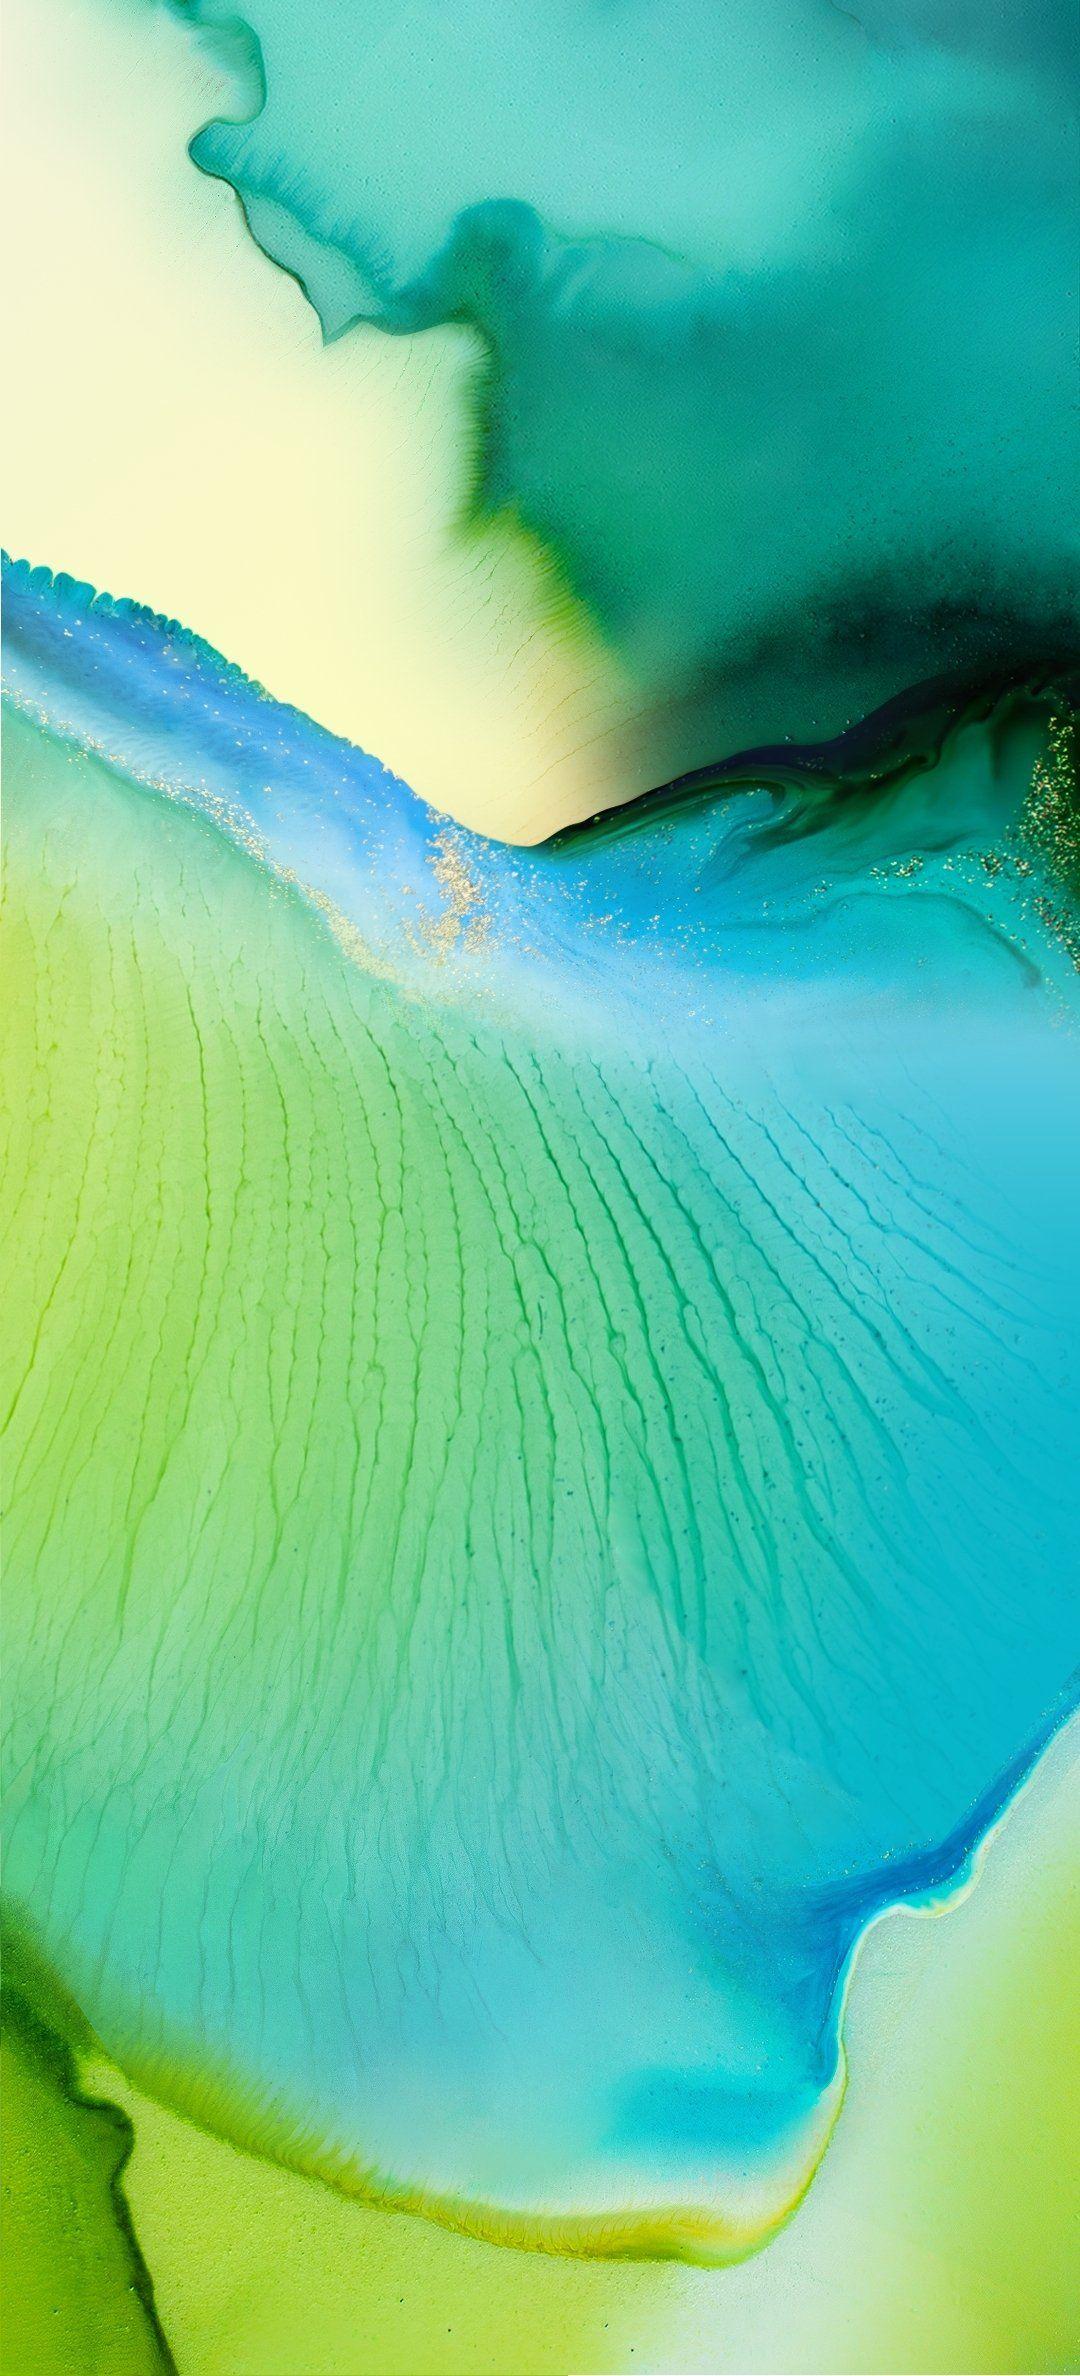 Vivo X50 Pro Wallpaper YTECHB Exclusive Galaxy phone wallpaper 1080x2376